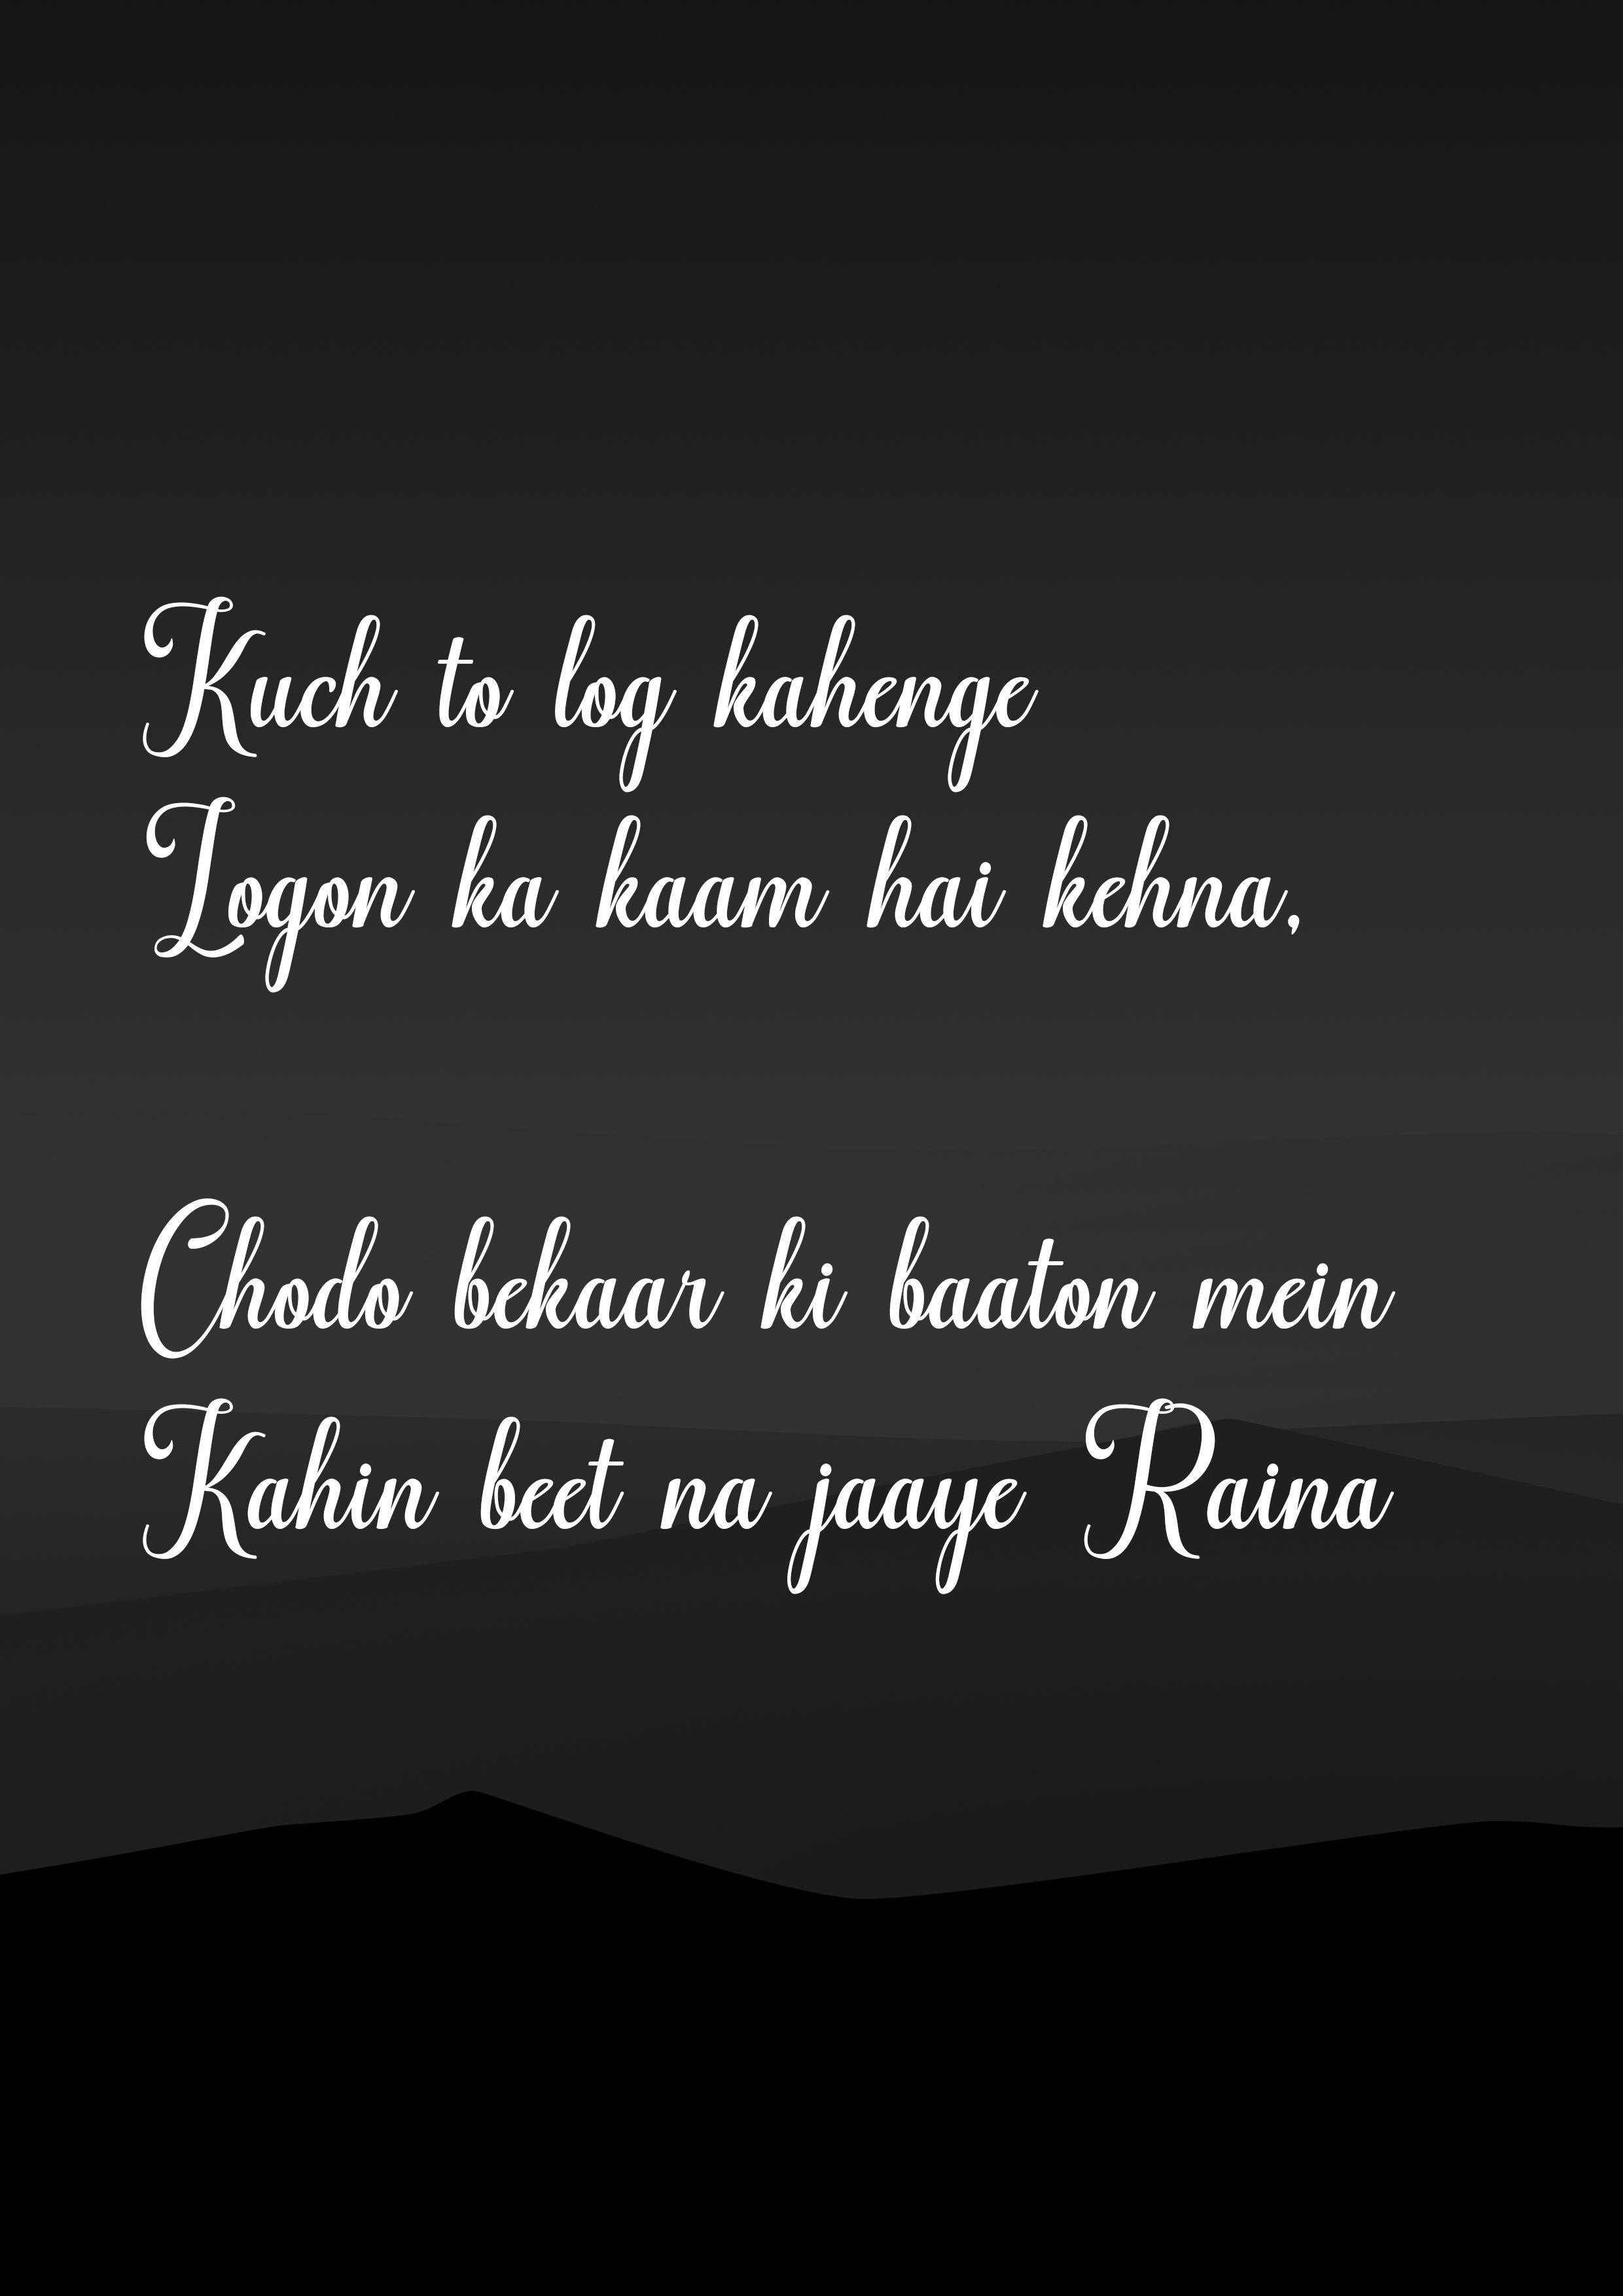 Kishore Kumar song lyrics that make the perfect social media captions 2